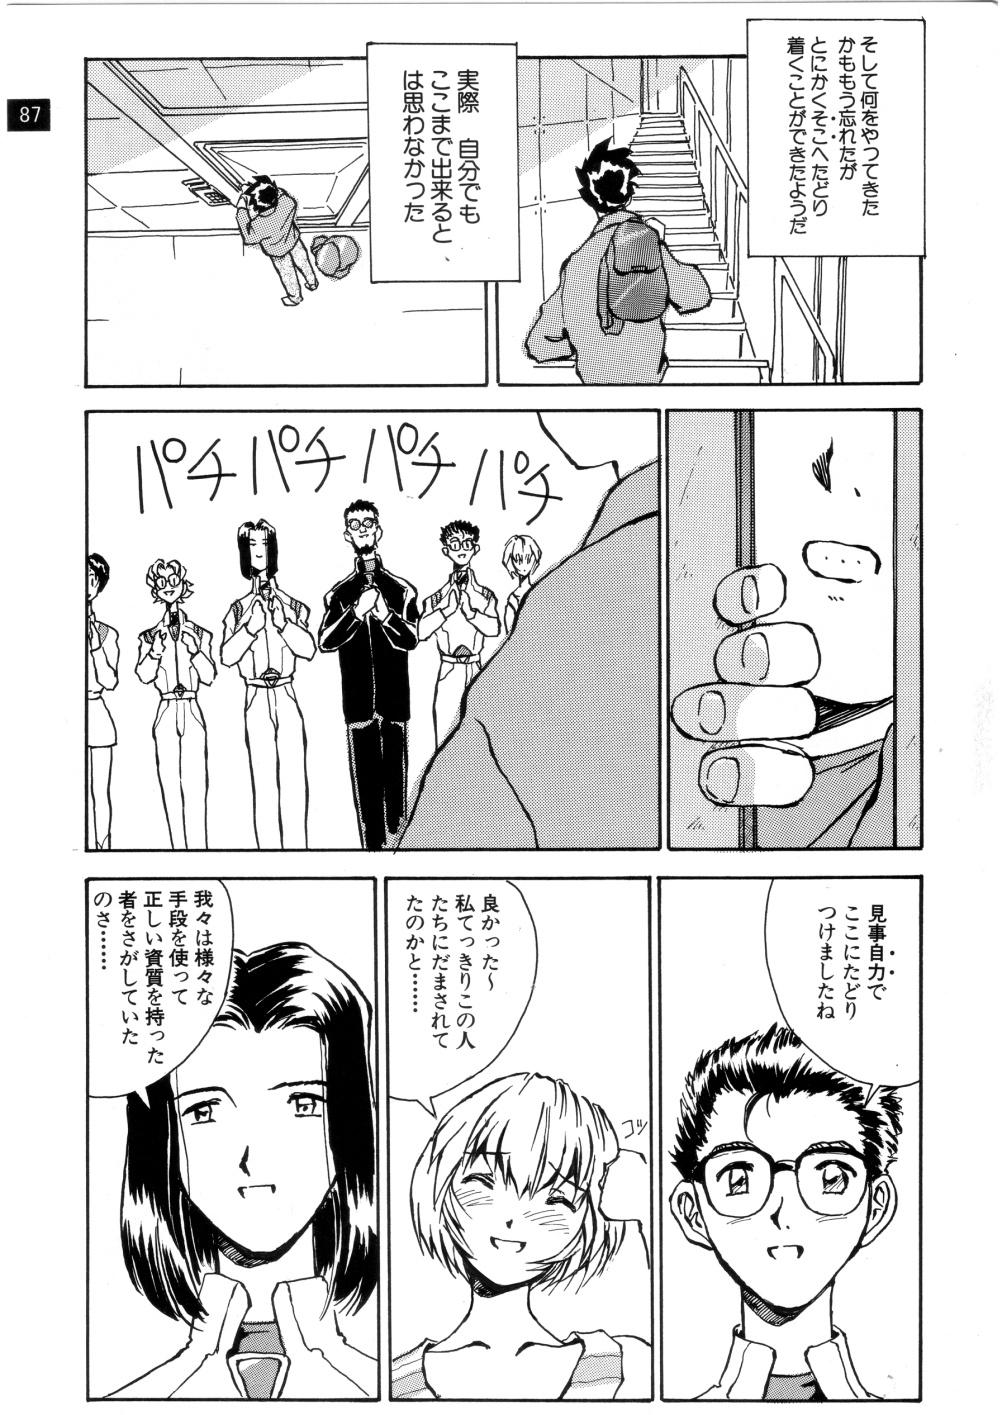 Zense Ki no Evangerikosan 87